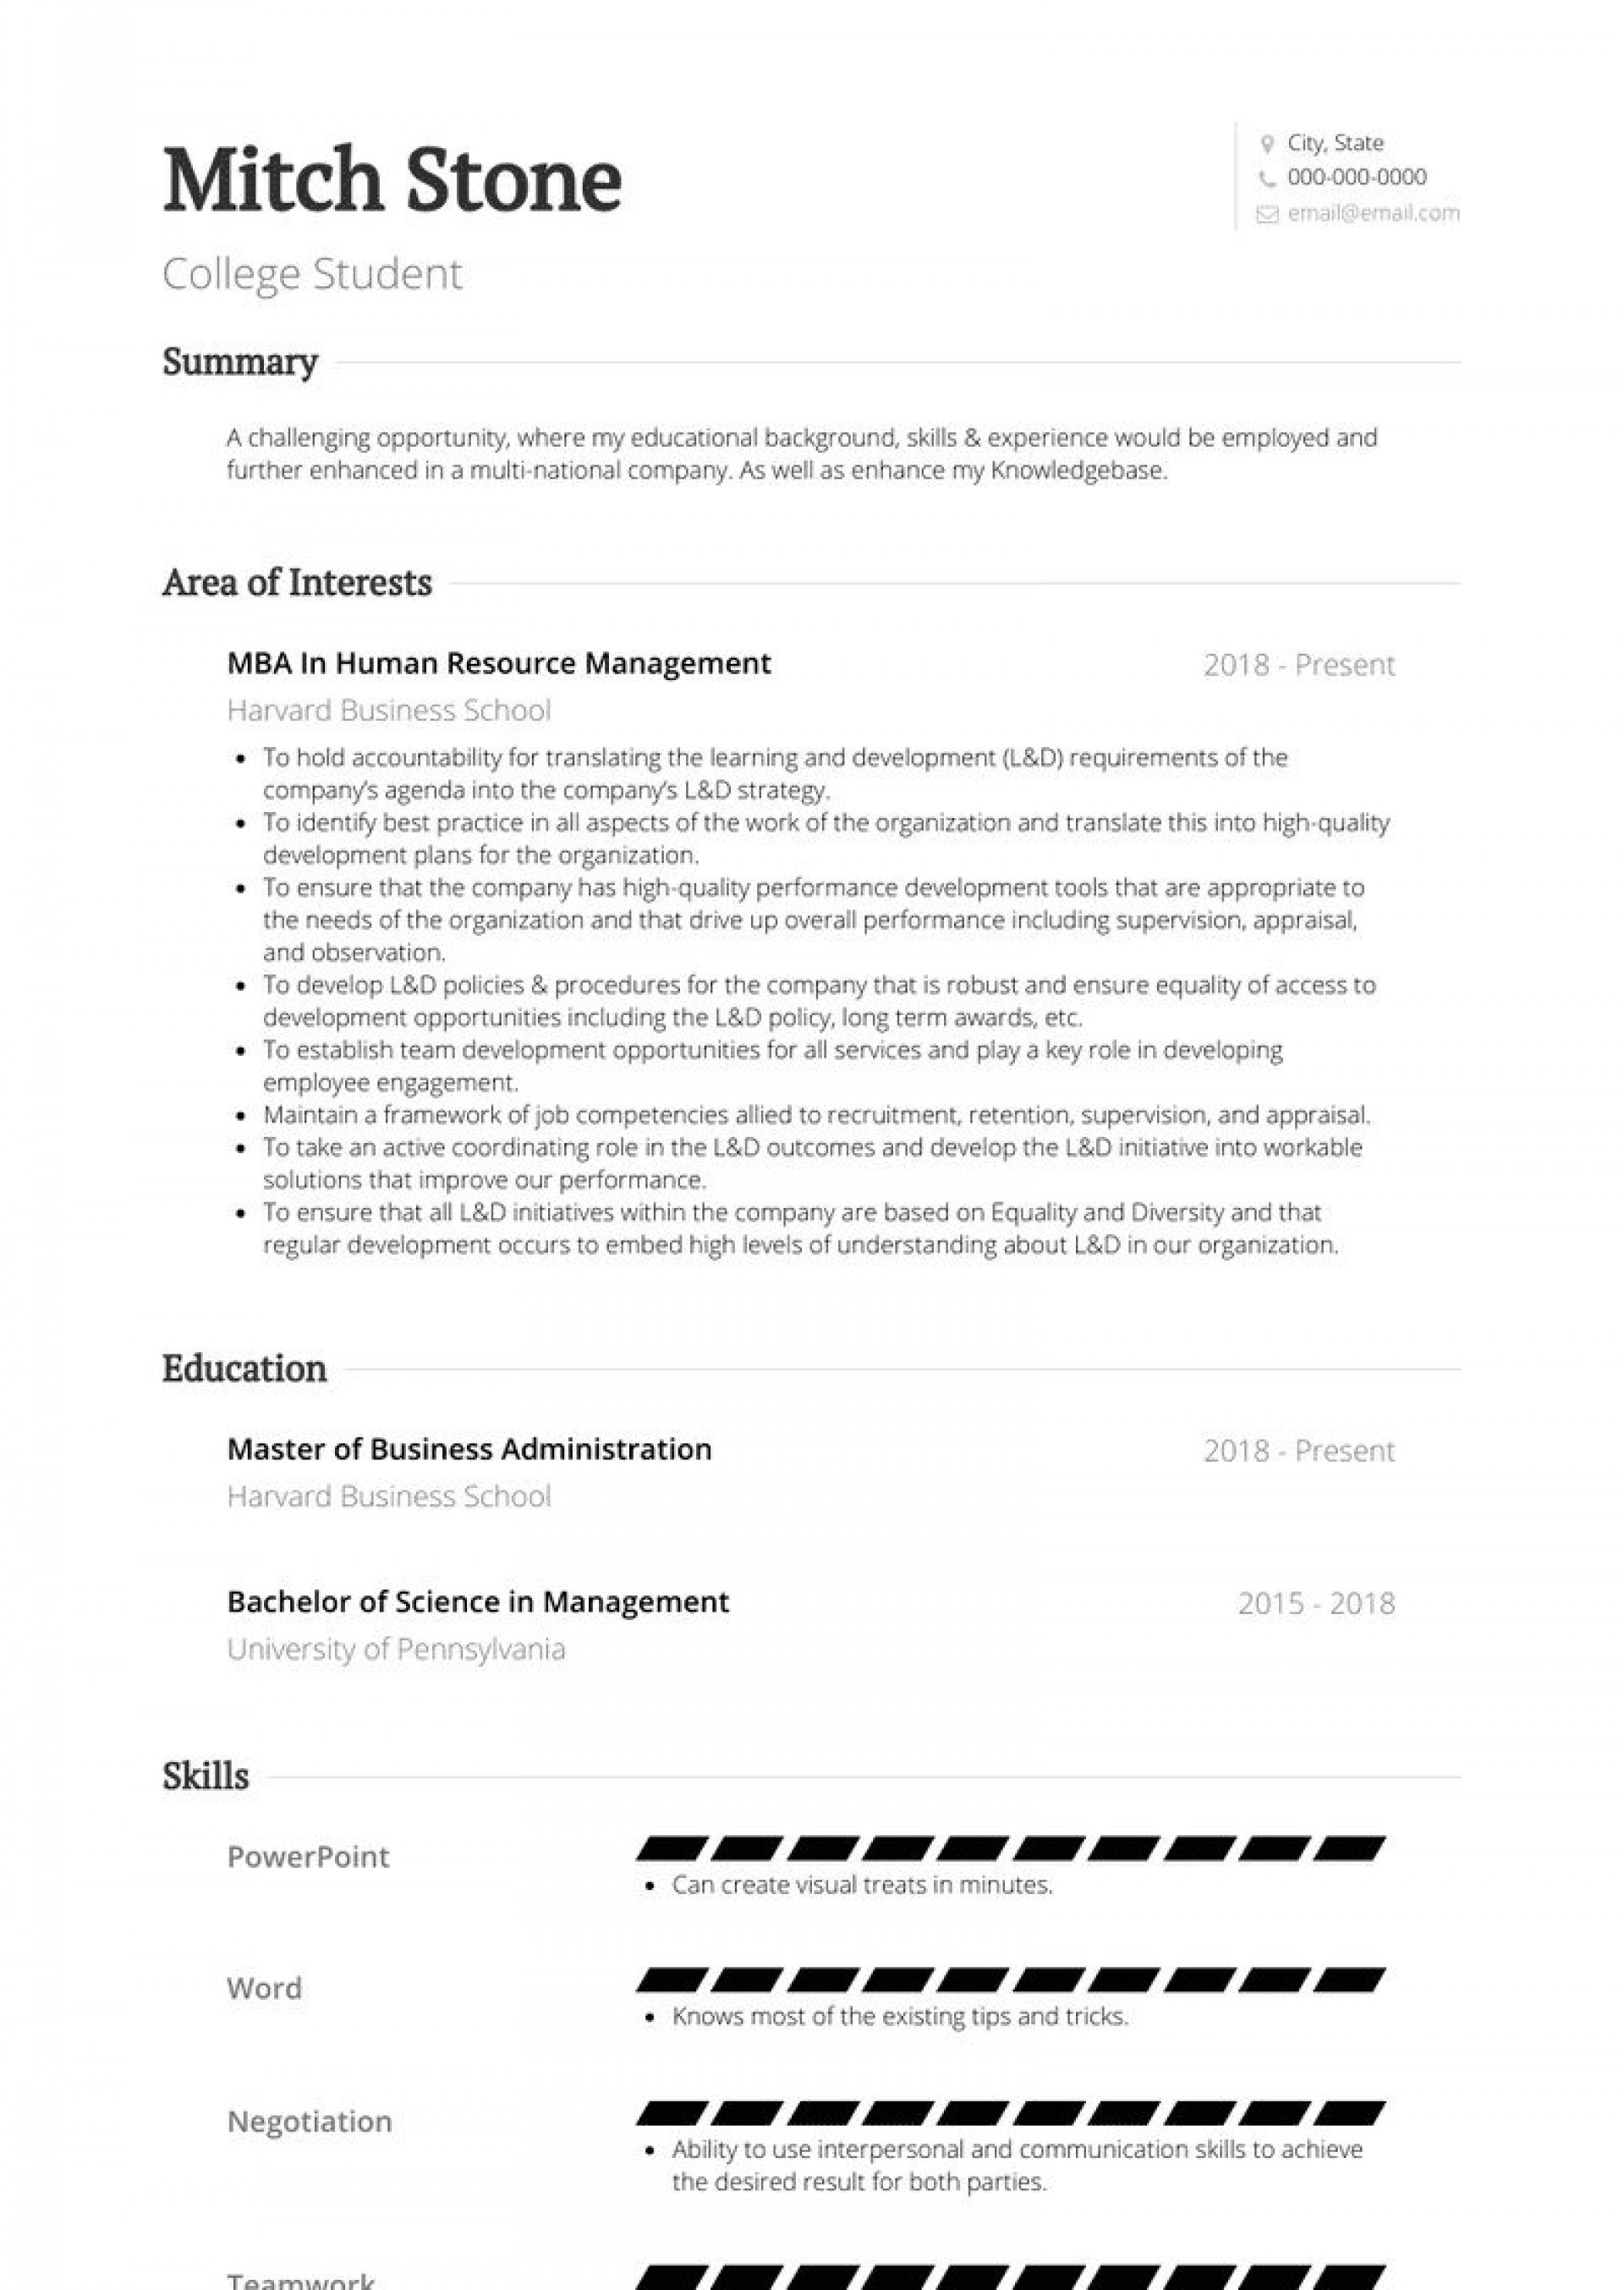 004 Striking Basic Student Resume Template High Def  Templates School Google Doc1920